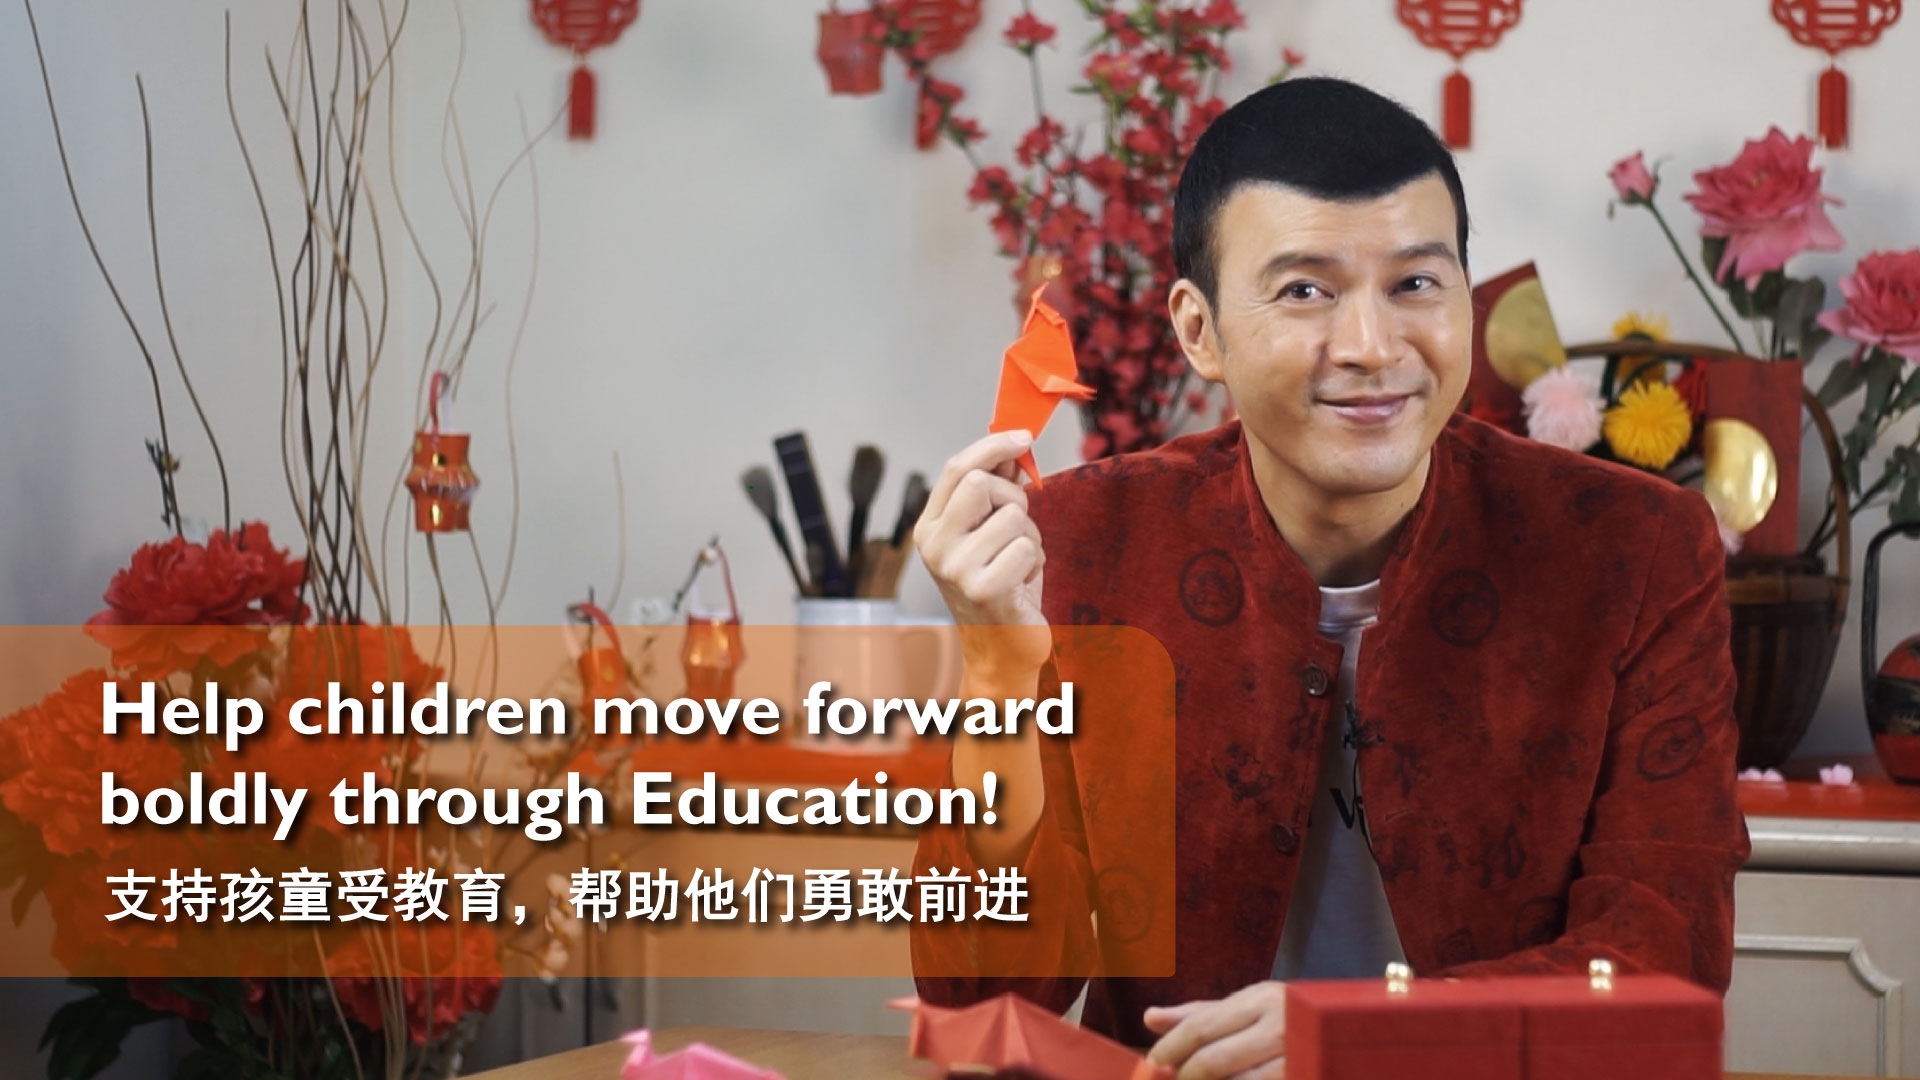 """Help children move forward boldly through Education!"" -Owen Yap"